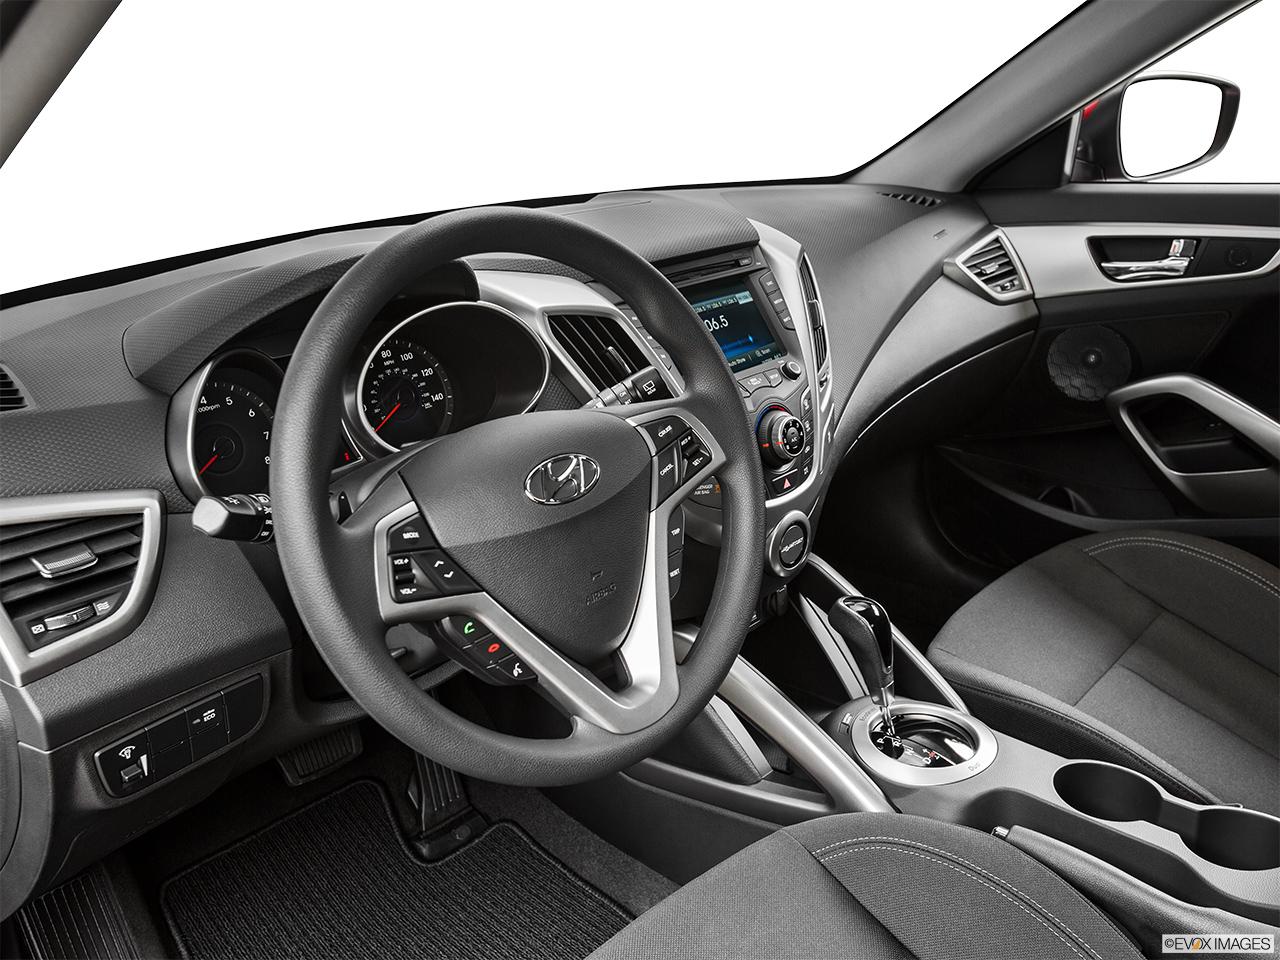 Custom car interior queens ny - 2015 Hyundai Veloster 3dr Manual Coupe Interior Hero Driver S Side